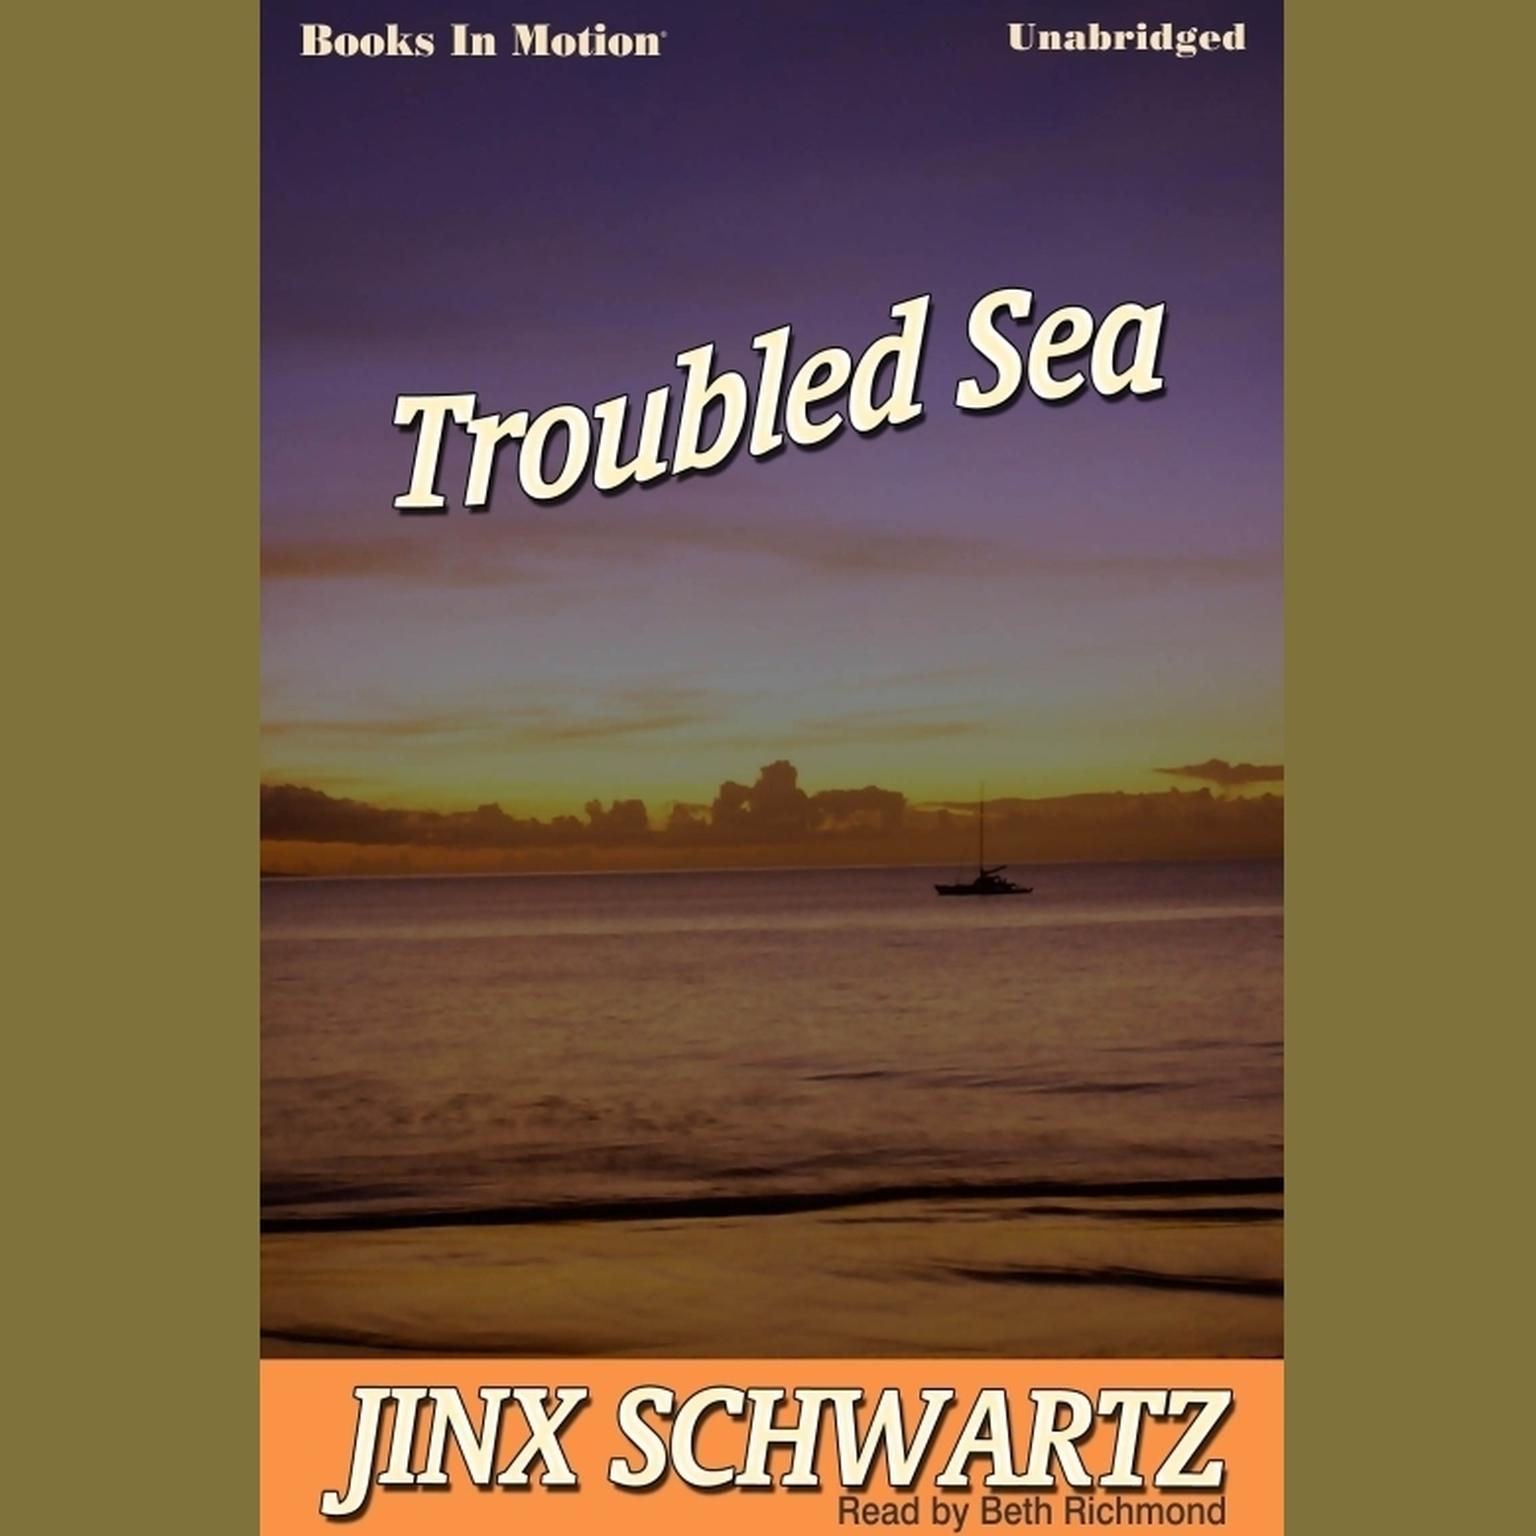 Troubled Sea Audiobook, by Jinx Schwartz